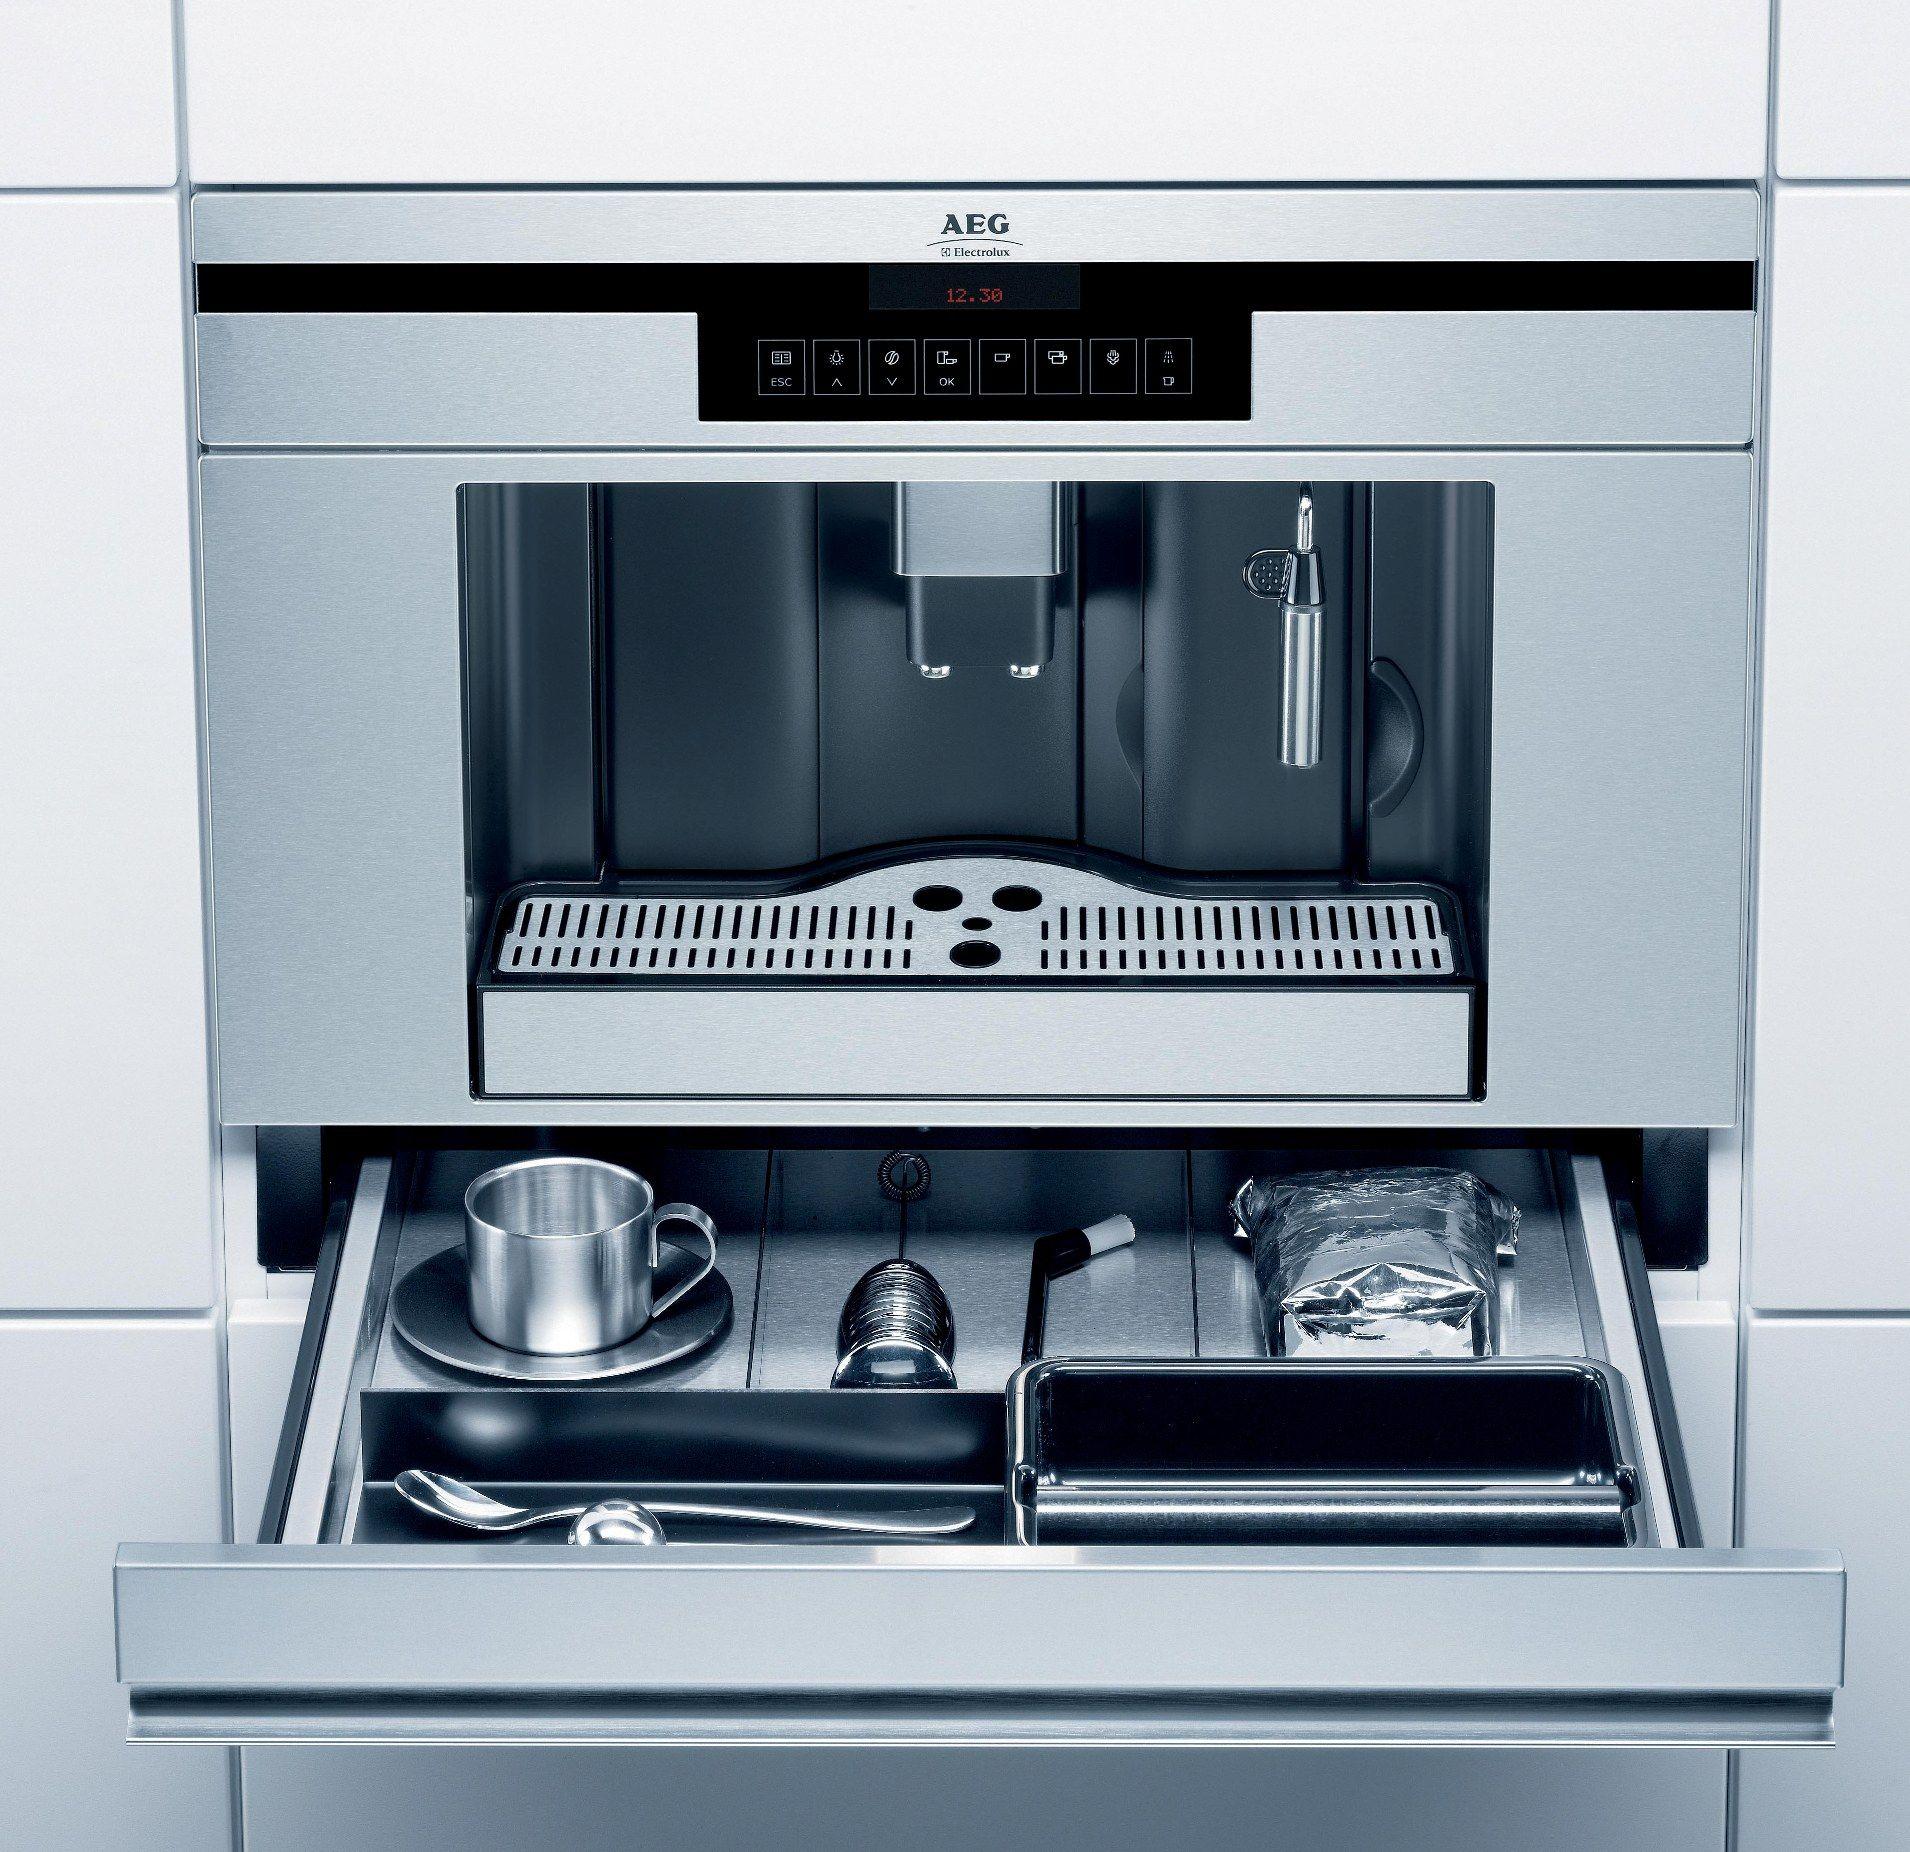 Uncategorized Aeg Kitchen Appliances Review aeg electrolux pe3810m hjemme pinterest in style pe3810m